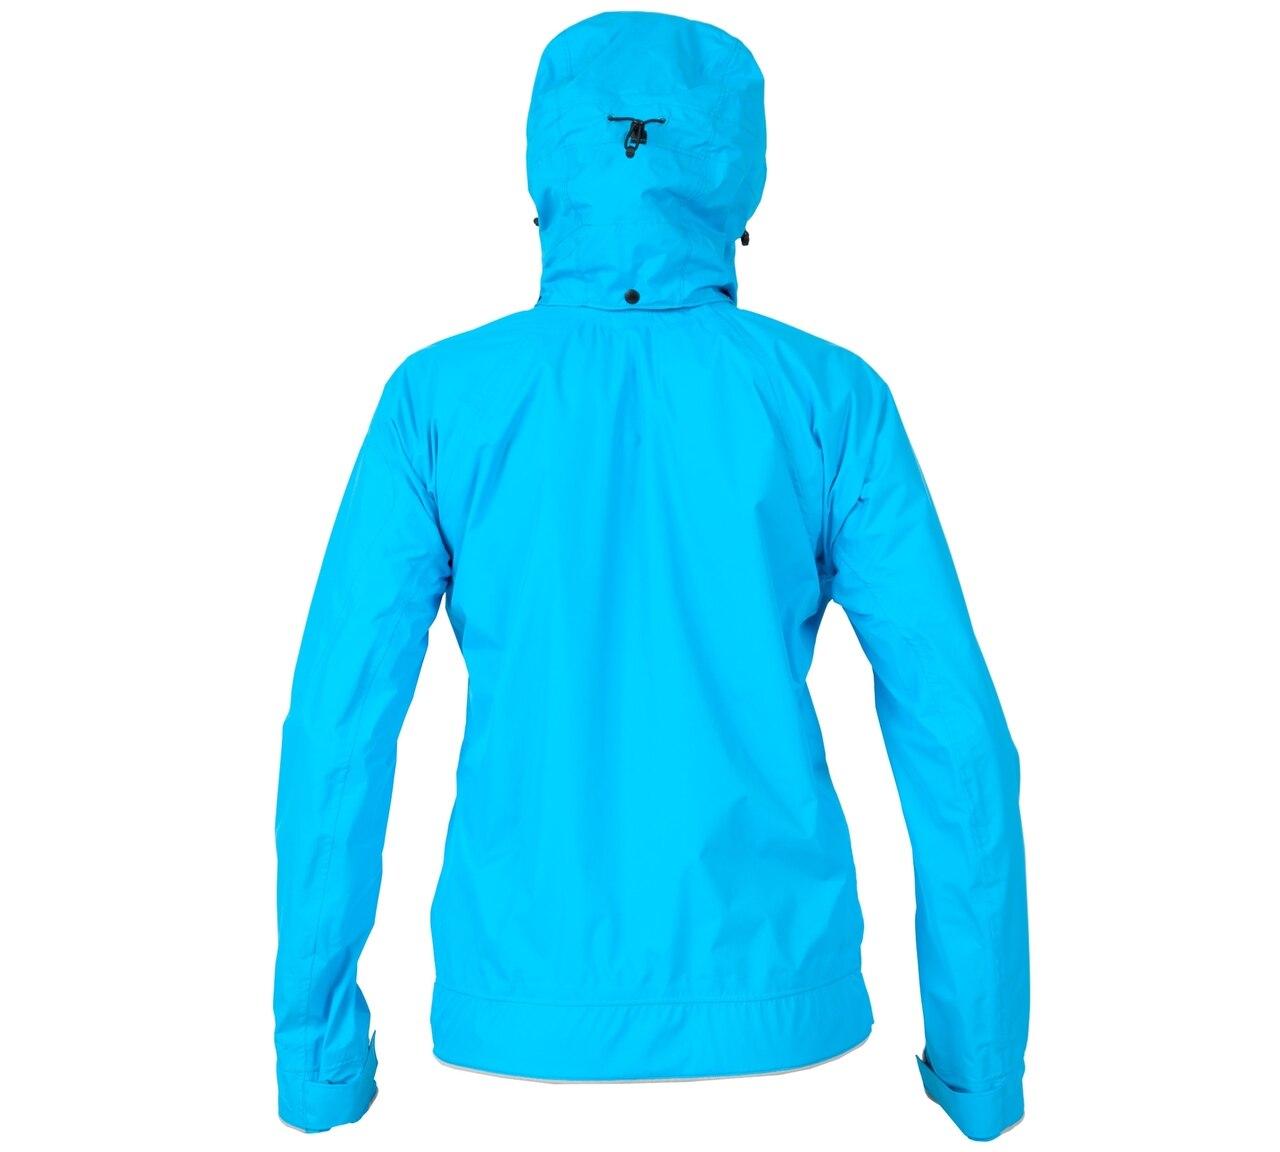 Kokata Jetty jacket, woman